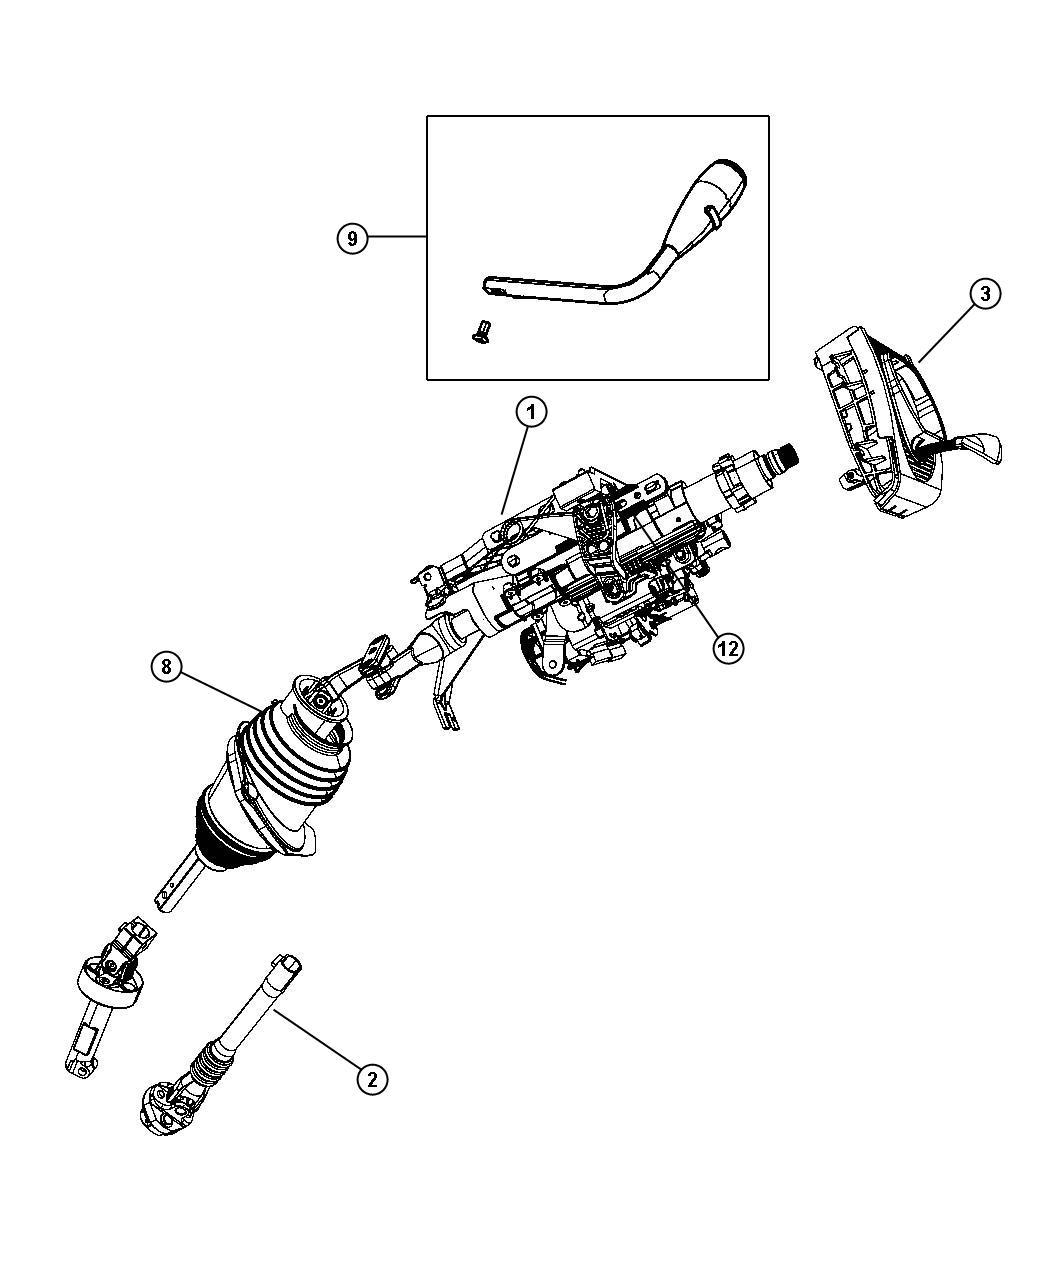 Service manual [2011 Cadillac Cts V Tilt Steering Column